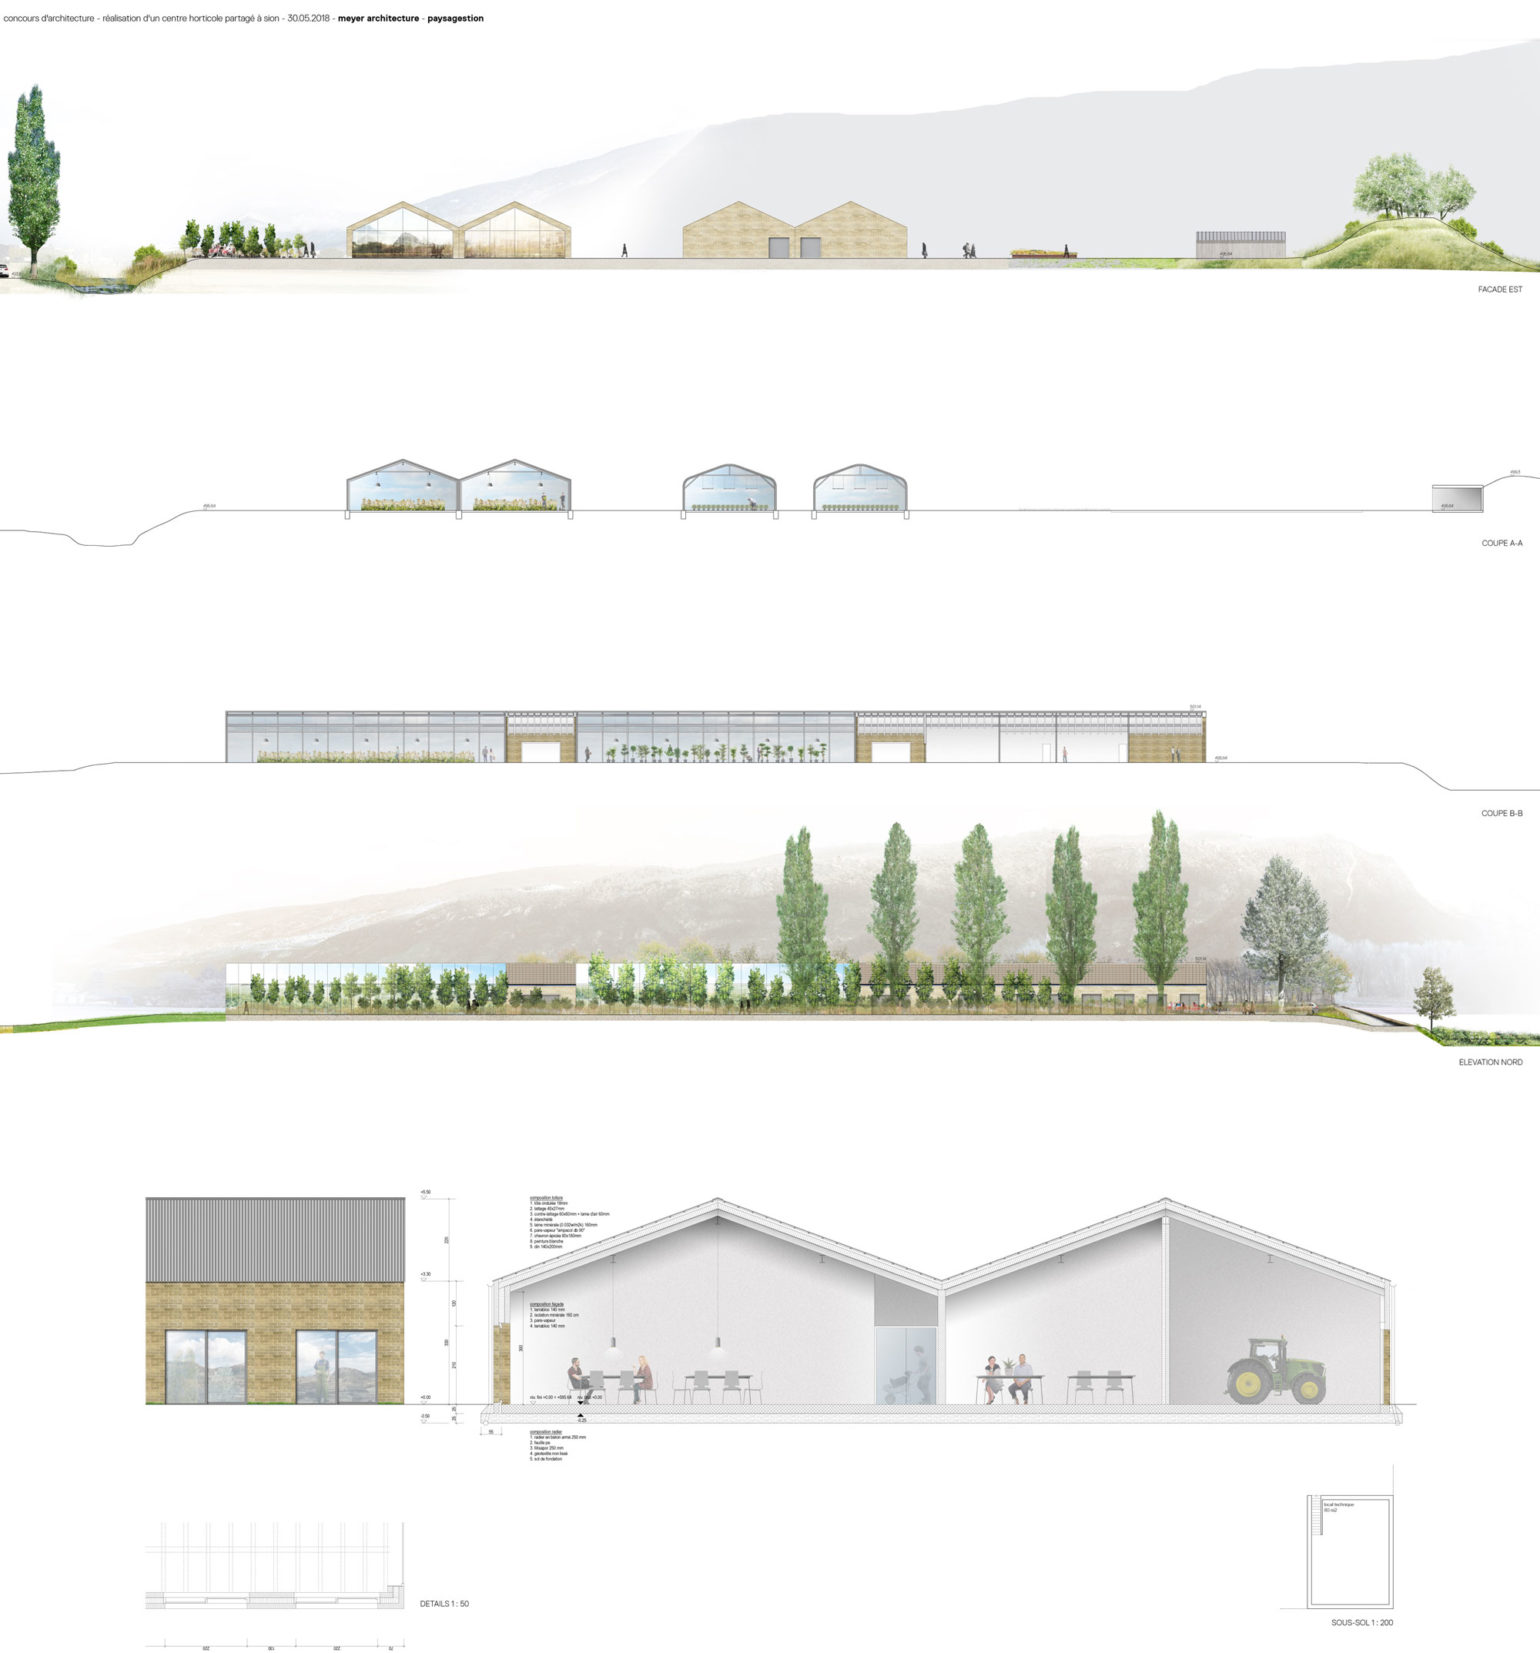 concours_centre_horticole_sion_meyer_architecture__sion_05